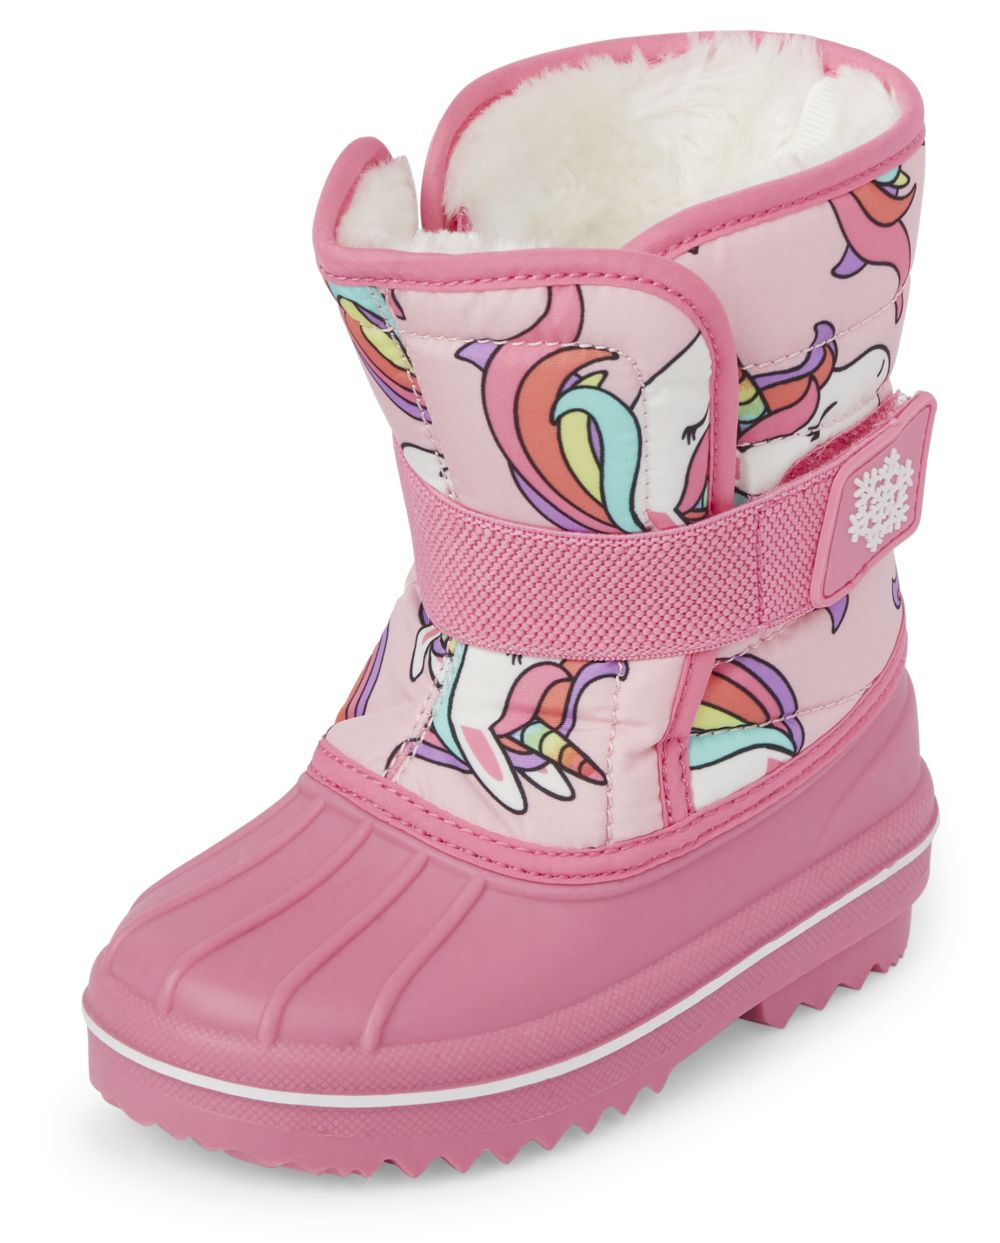 Toddler Girls Unicorn Snow Boots